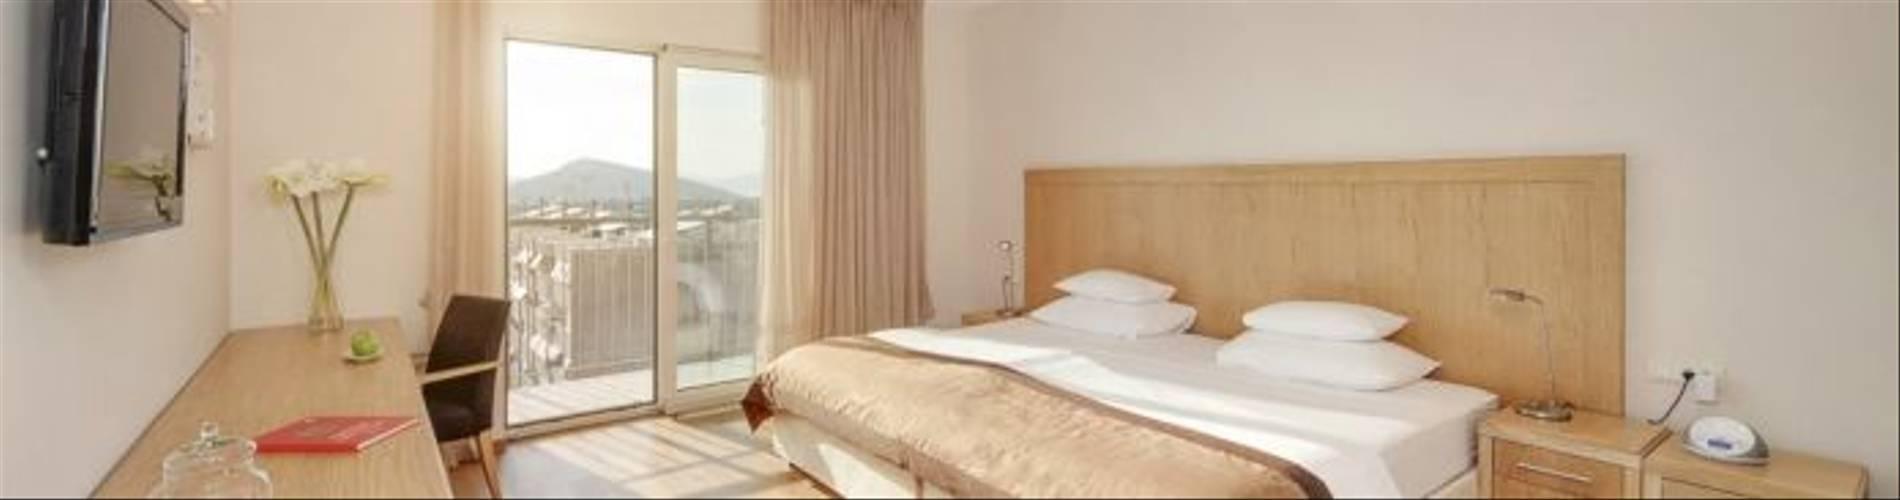 HotelResidence_DIOKLECIJAN_room-bedRoom-interier-panorama_2048px_5D3A2360-695x409.jpg